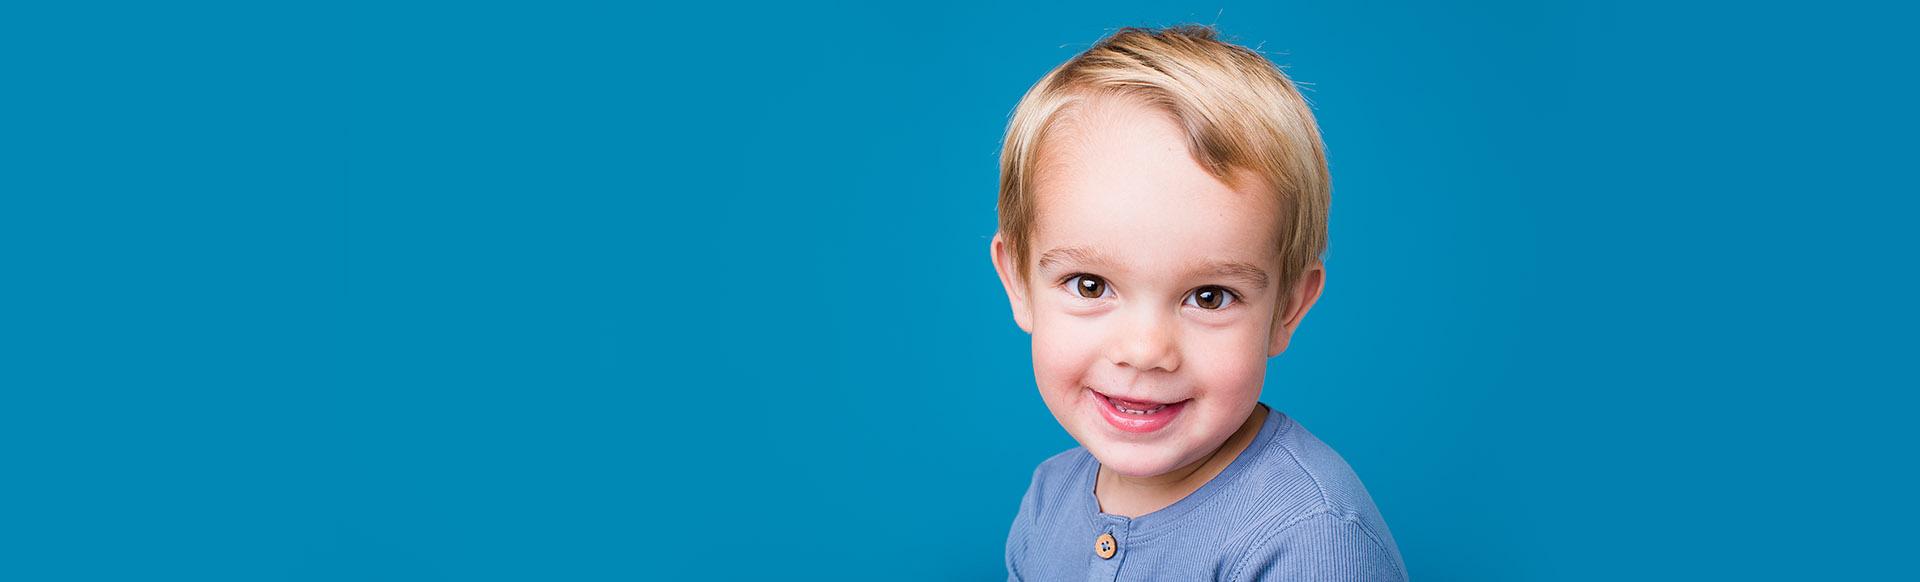 Barnefotografering - Barnefoto